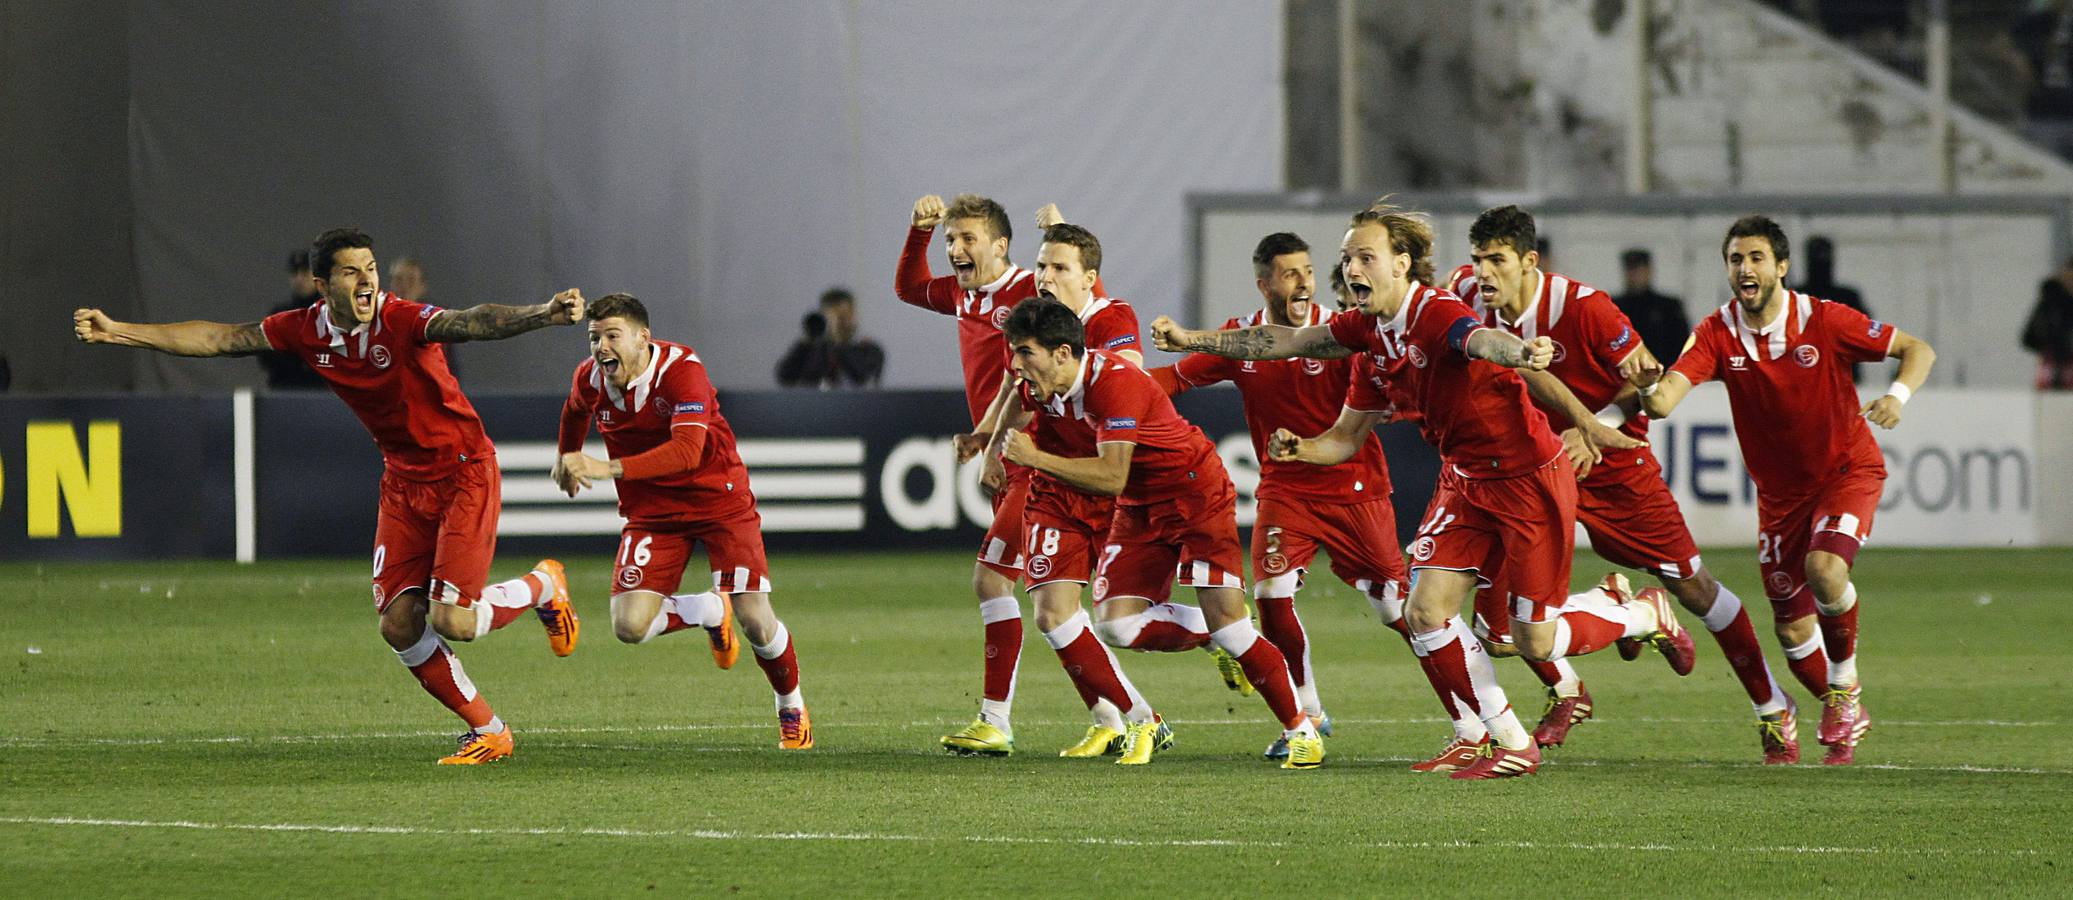 El Sevilla se lleva el euroderbi